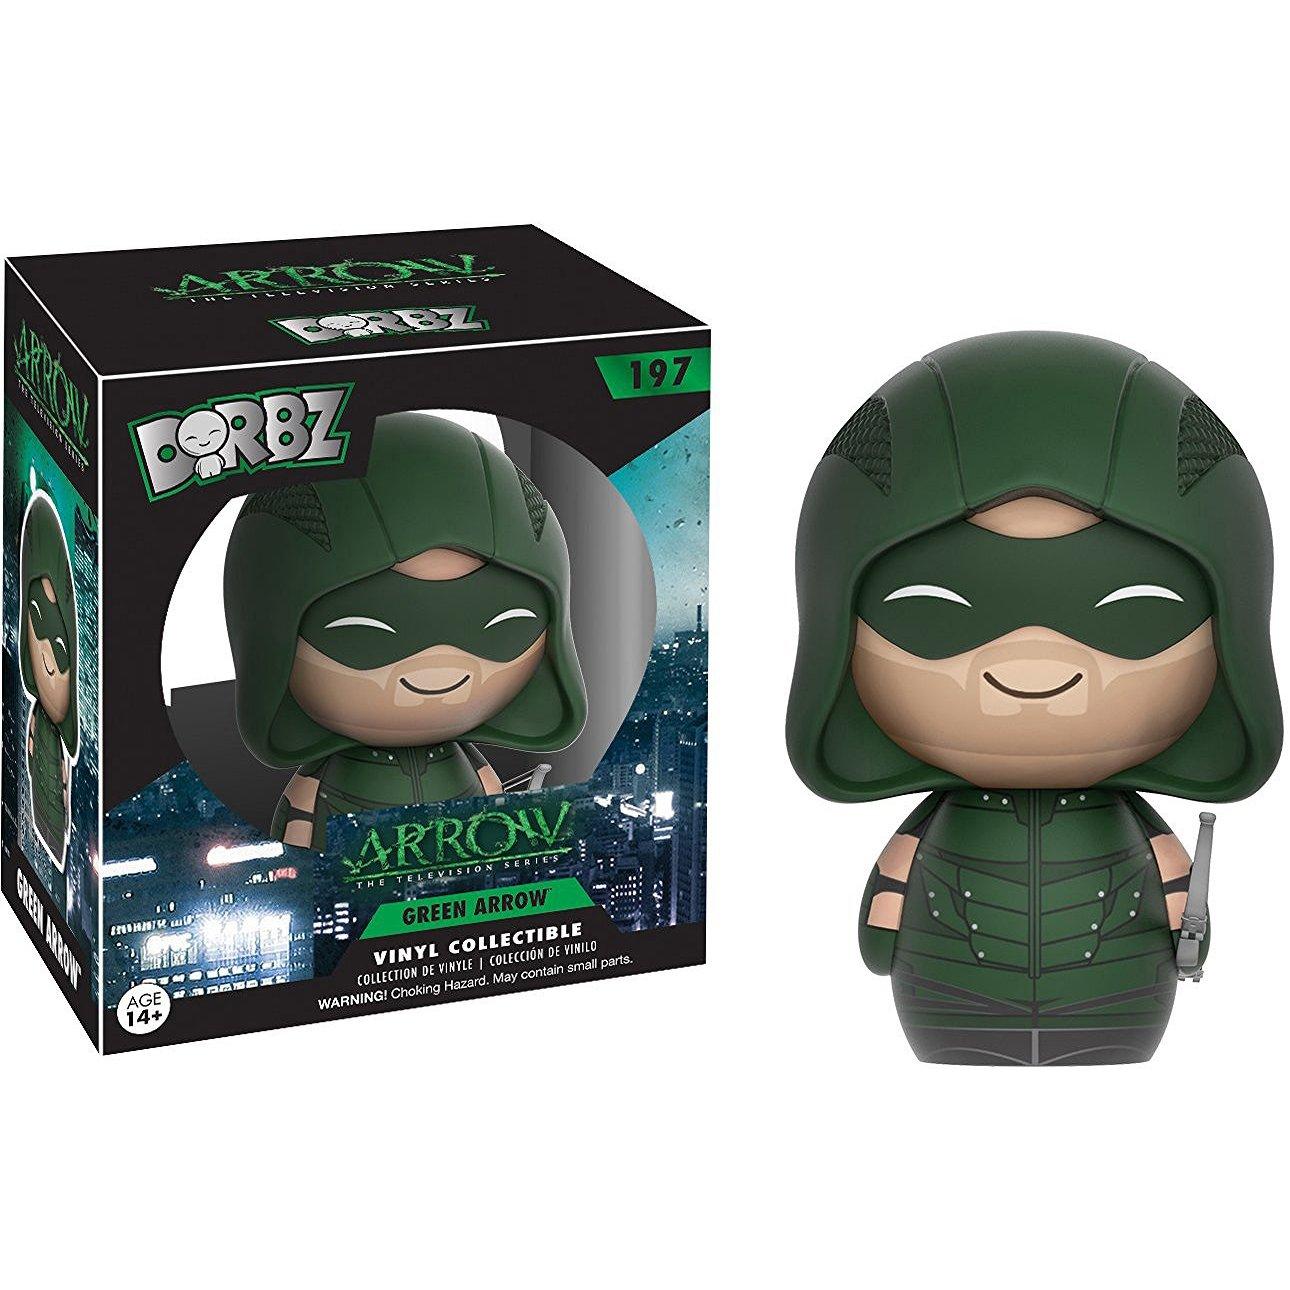 Green Arrow Funko Dorbz x Arrow TV Series Mini Vinyl Figure 1 FREE Official DC Trading Card Bundle 113113